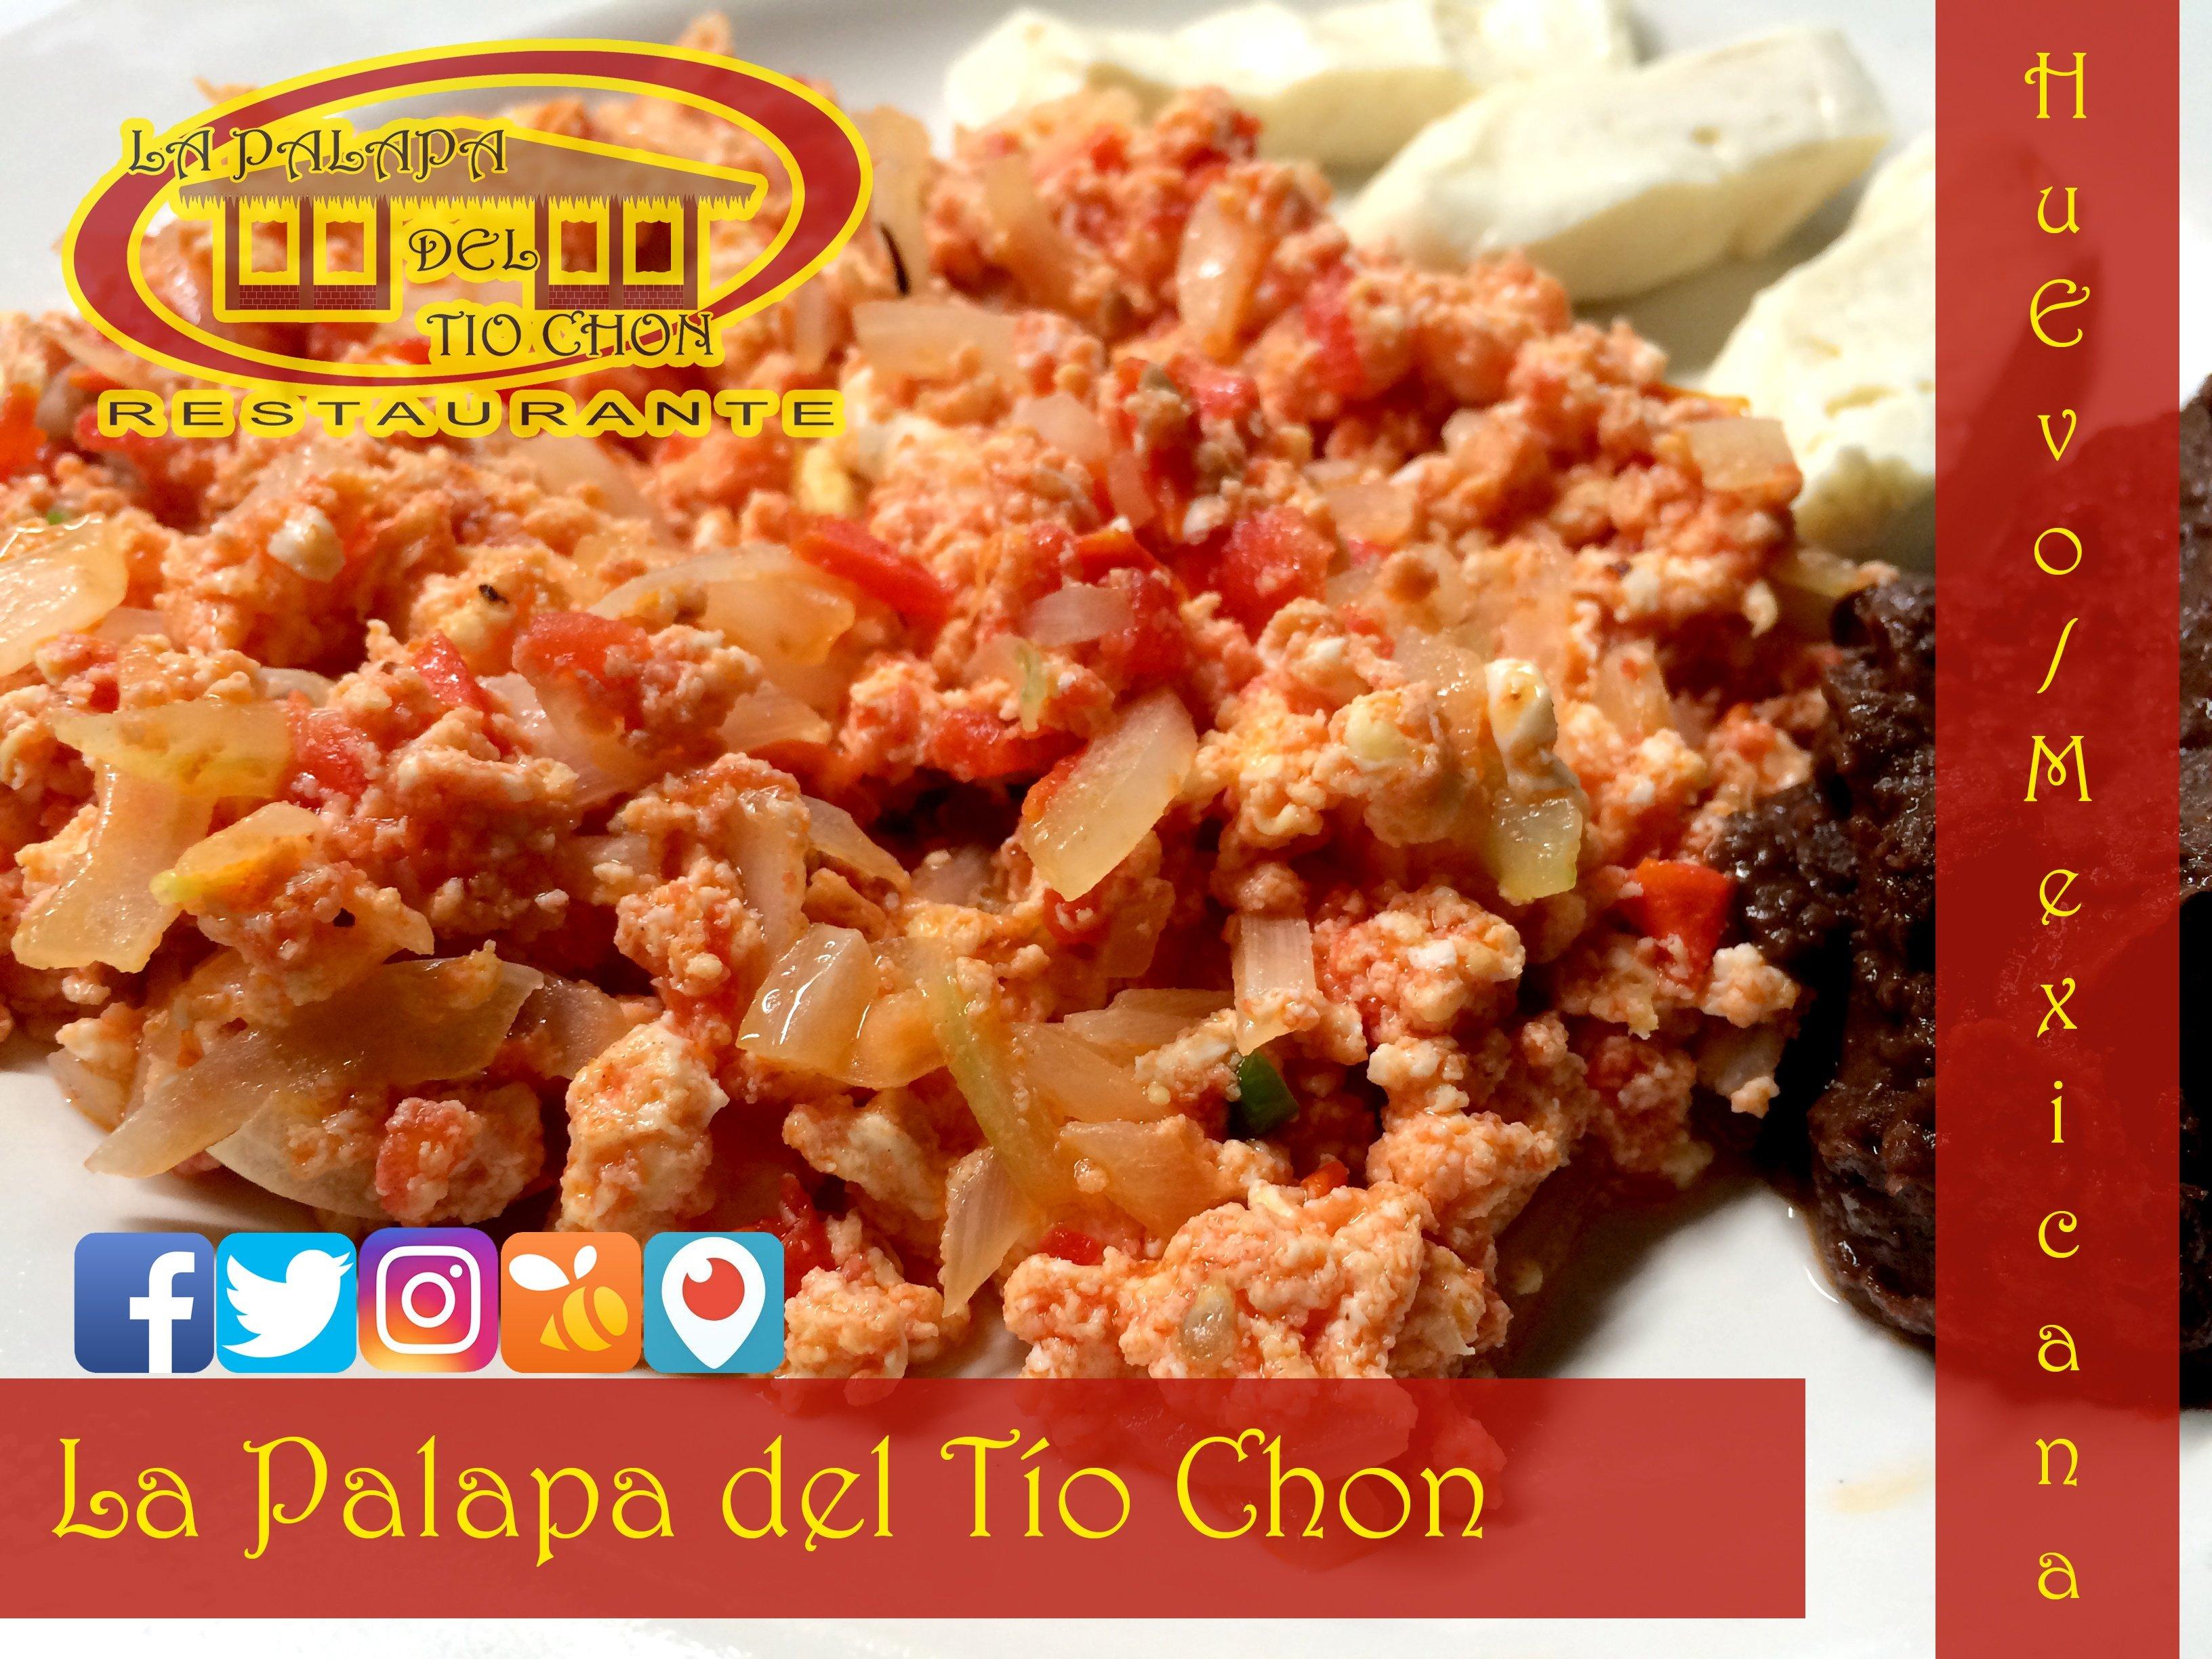 https://0201.nccdn.net/1_2/000/000/149/b03/huevo-a-la-mexicana-3264x2448.jpg